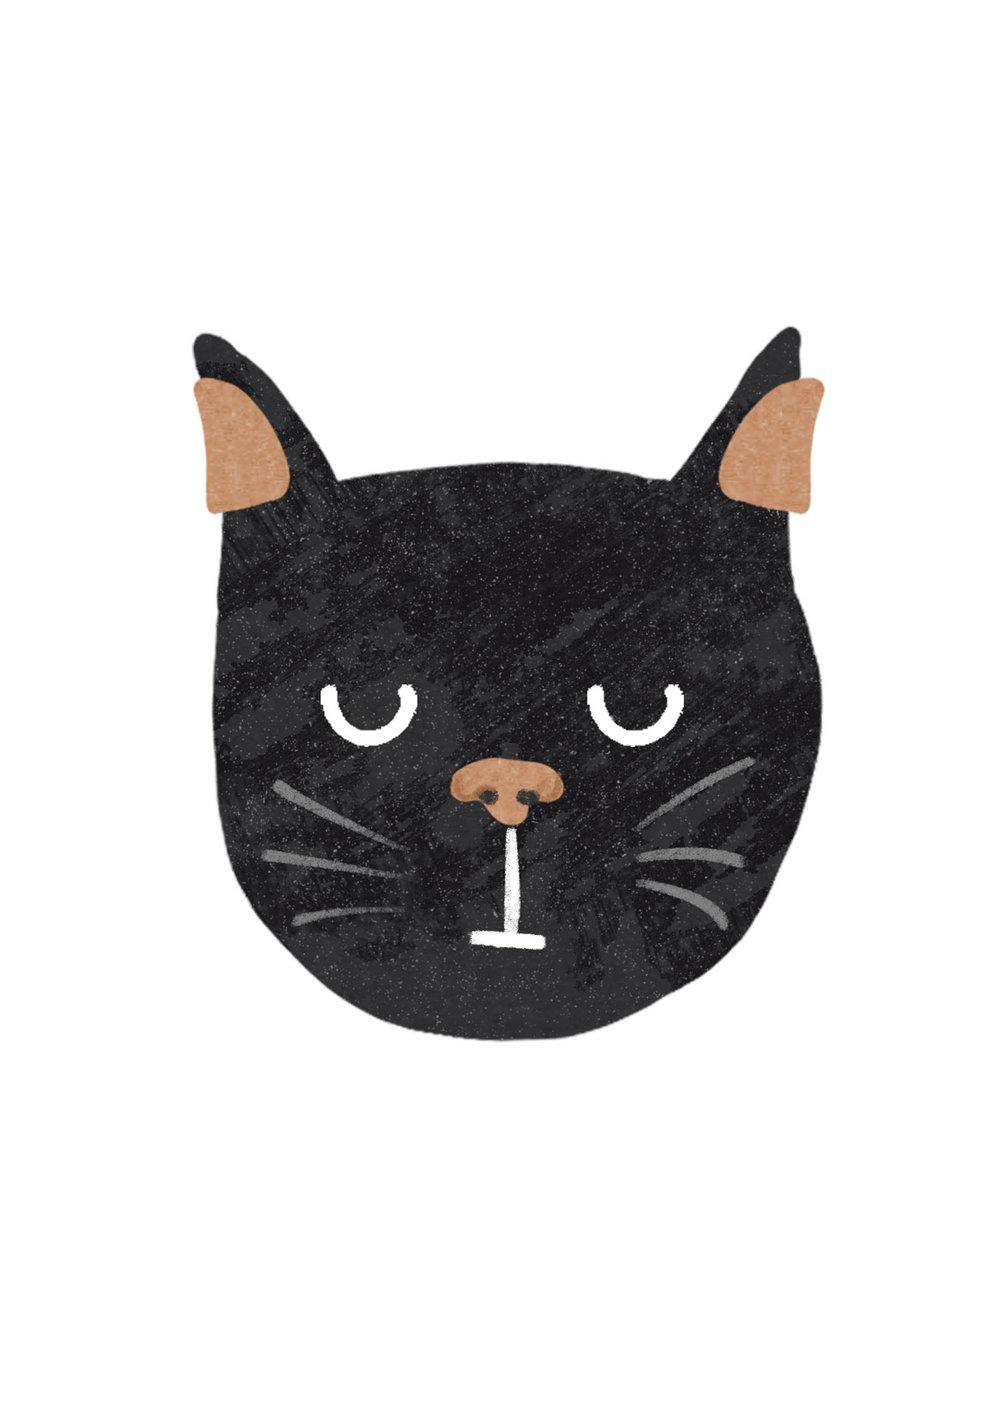 a5 cat.jpg